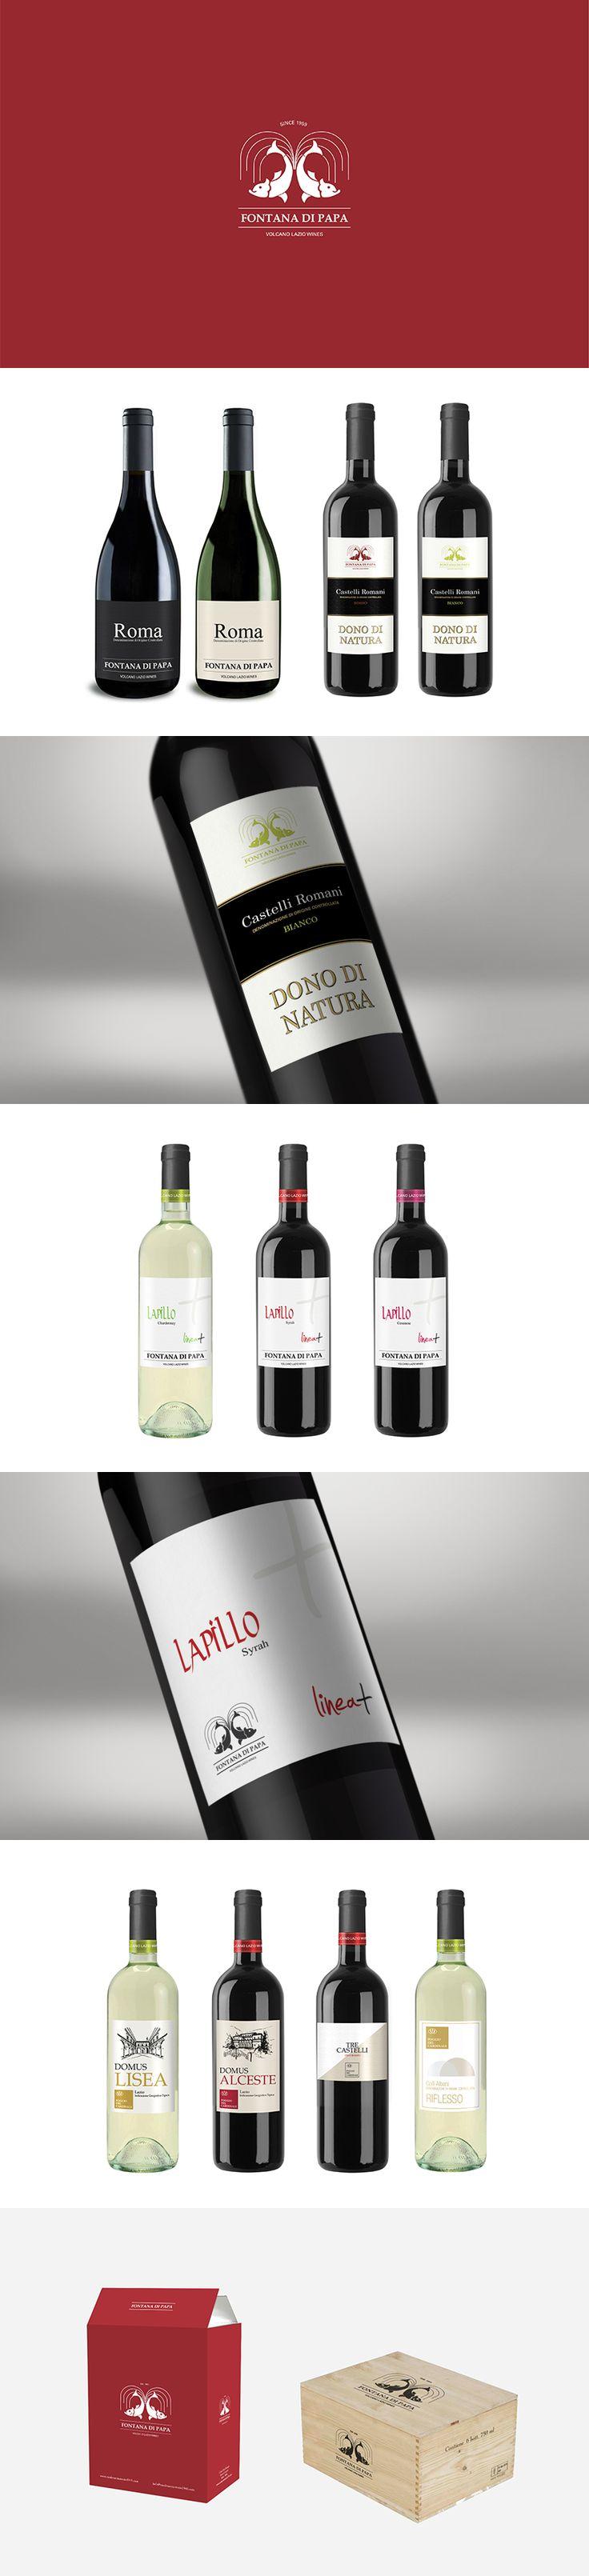 Fontana di Papa, Label Design ─ Giulio Patrizi Design Agency ©   #wine #bottle #label #design